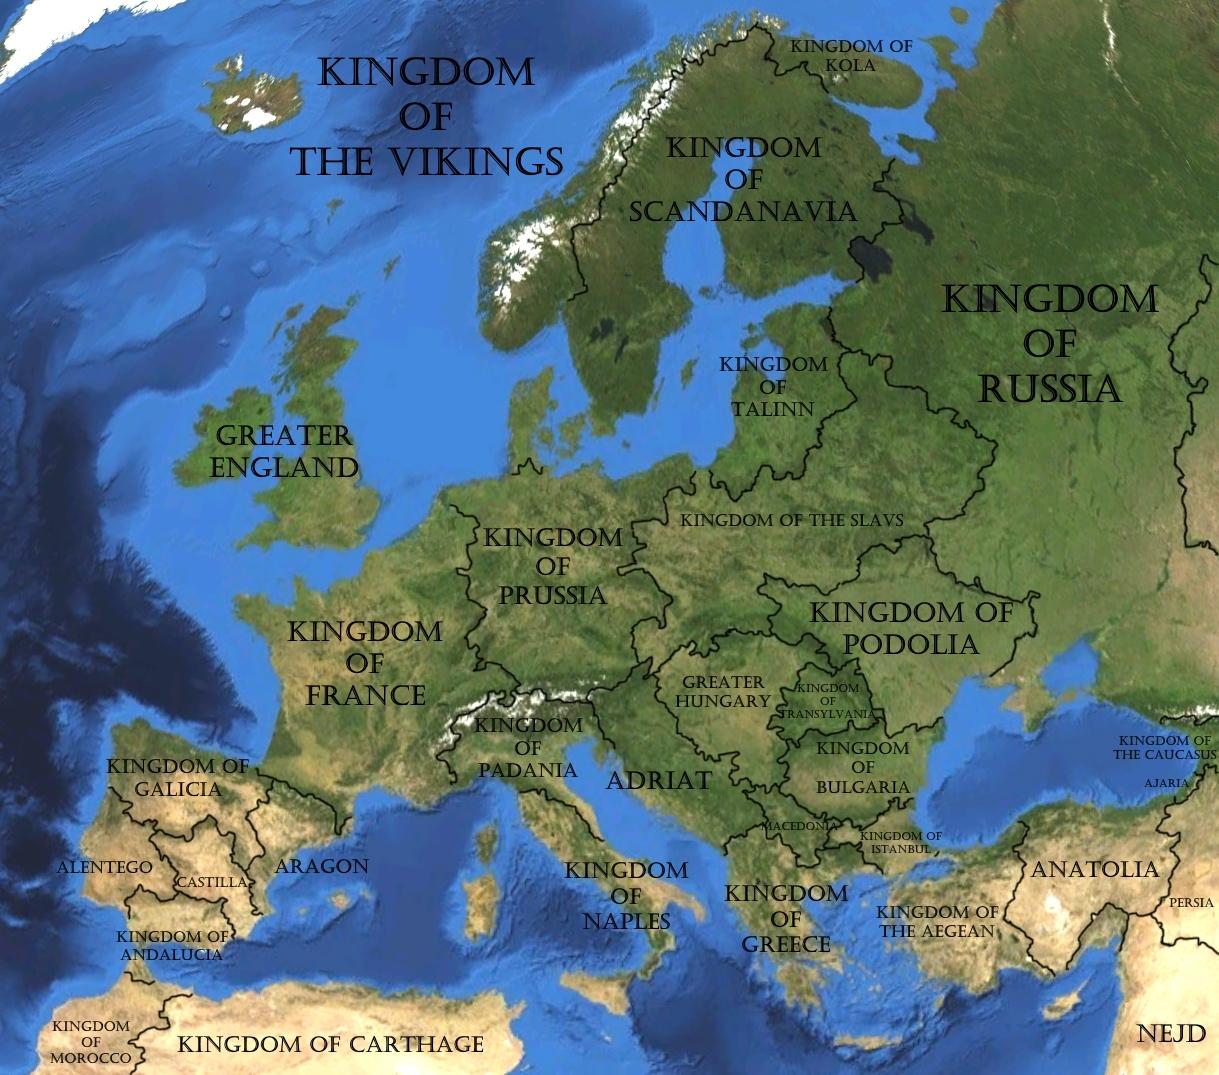 Image Europesatellitemap With Namesjpg TheFutureOfEuropes - World map online satellite 2015